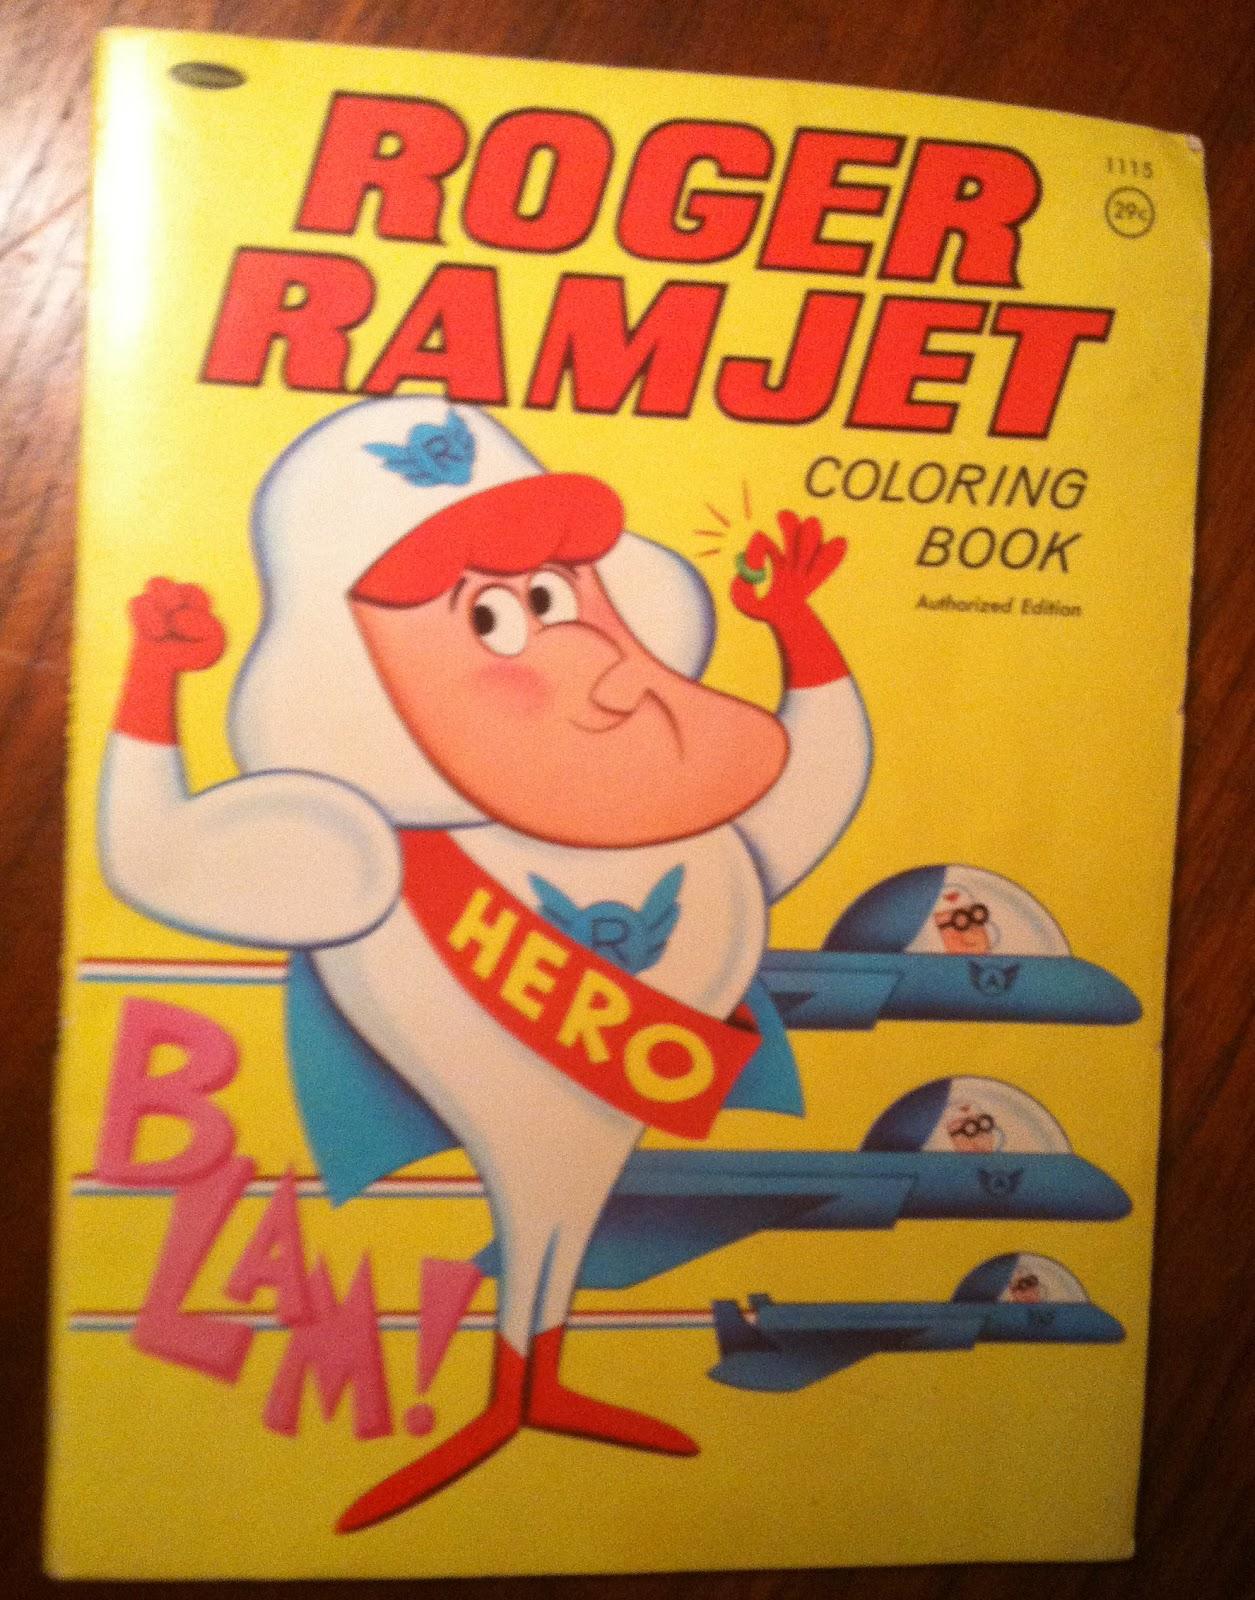 Flip Roger Ramjet Coloring Book JPG 1255x1600 Williams Sheet